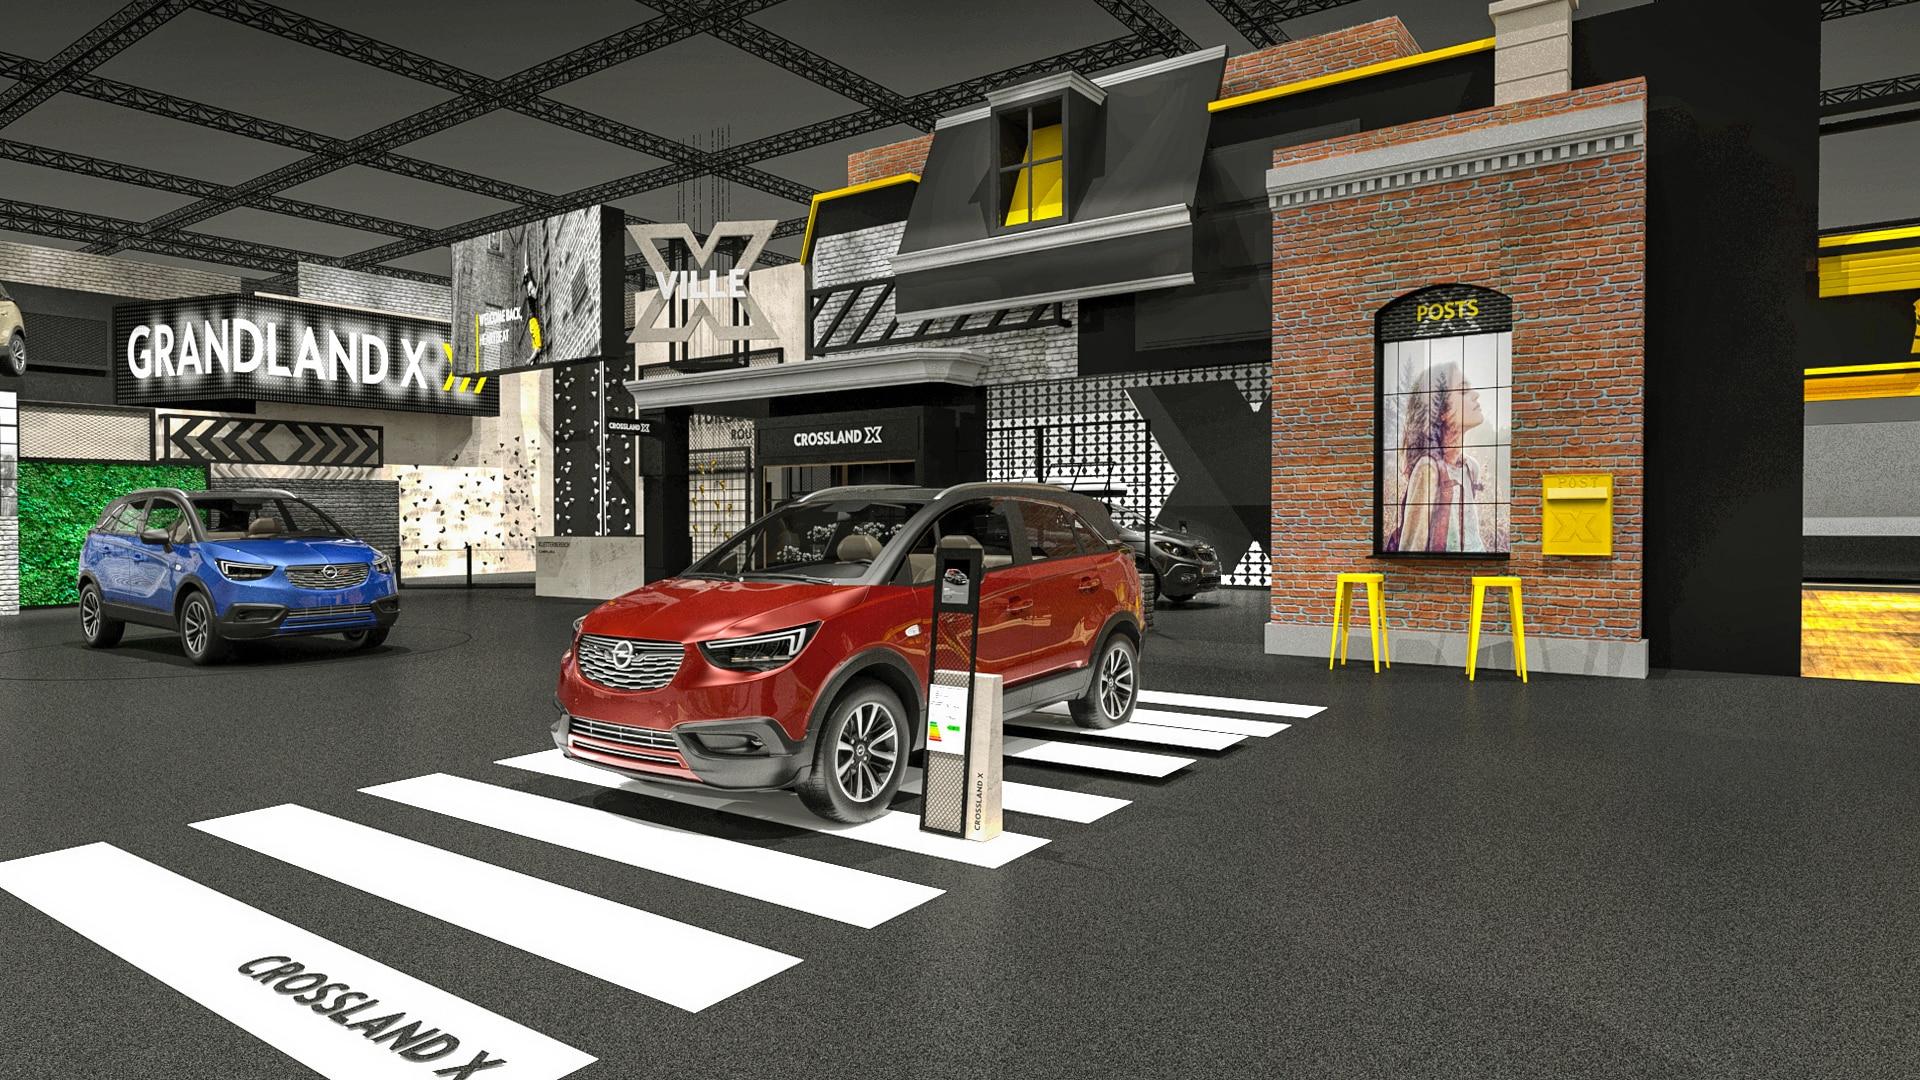 2017 - (Allemagne) Salon de Francfort / IAA Motor Show - Page 3 Stand-opel-francfort-iaa-2017-2